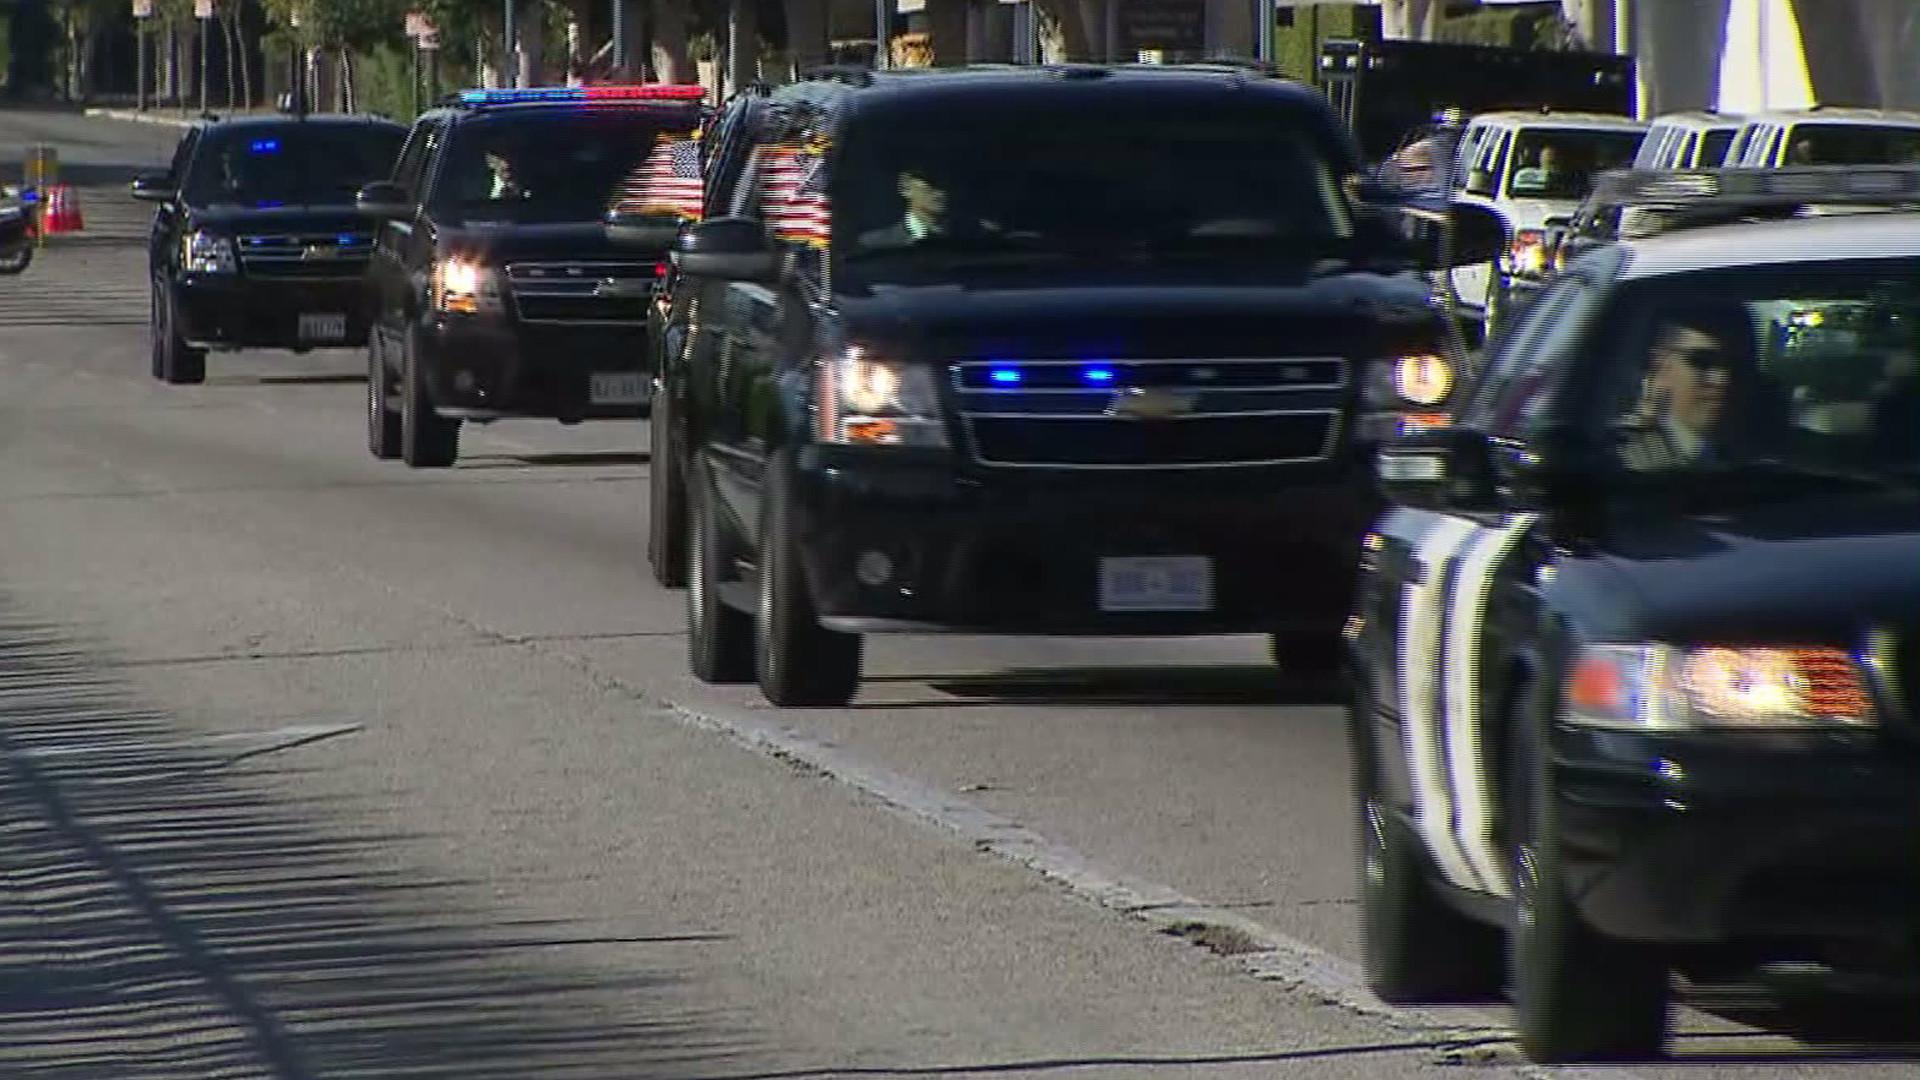 presidential motorcade | Presidential Motorcade The presidential motorcade